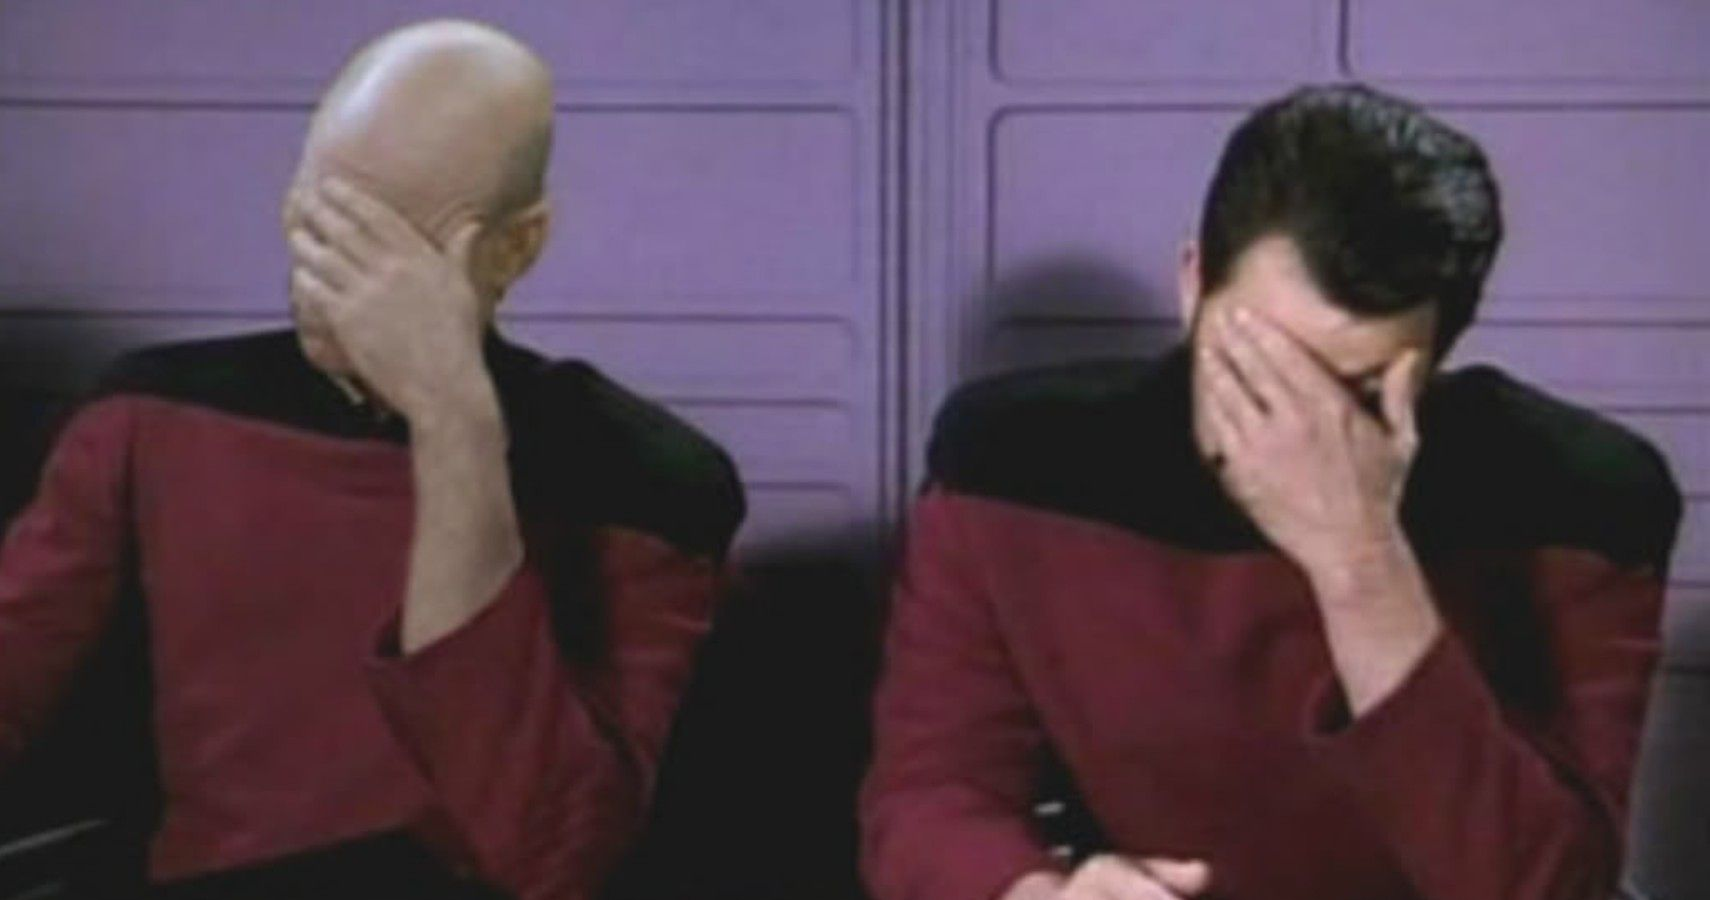 Star Trek: 10 TNG Logic Memes That Are True And Hilarious